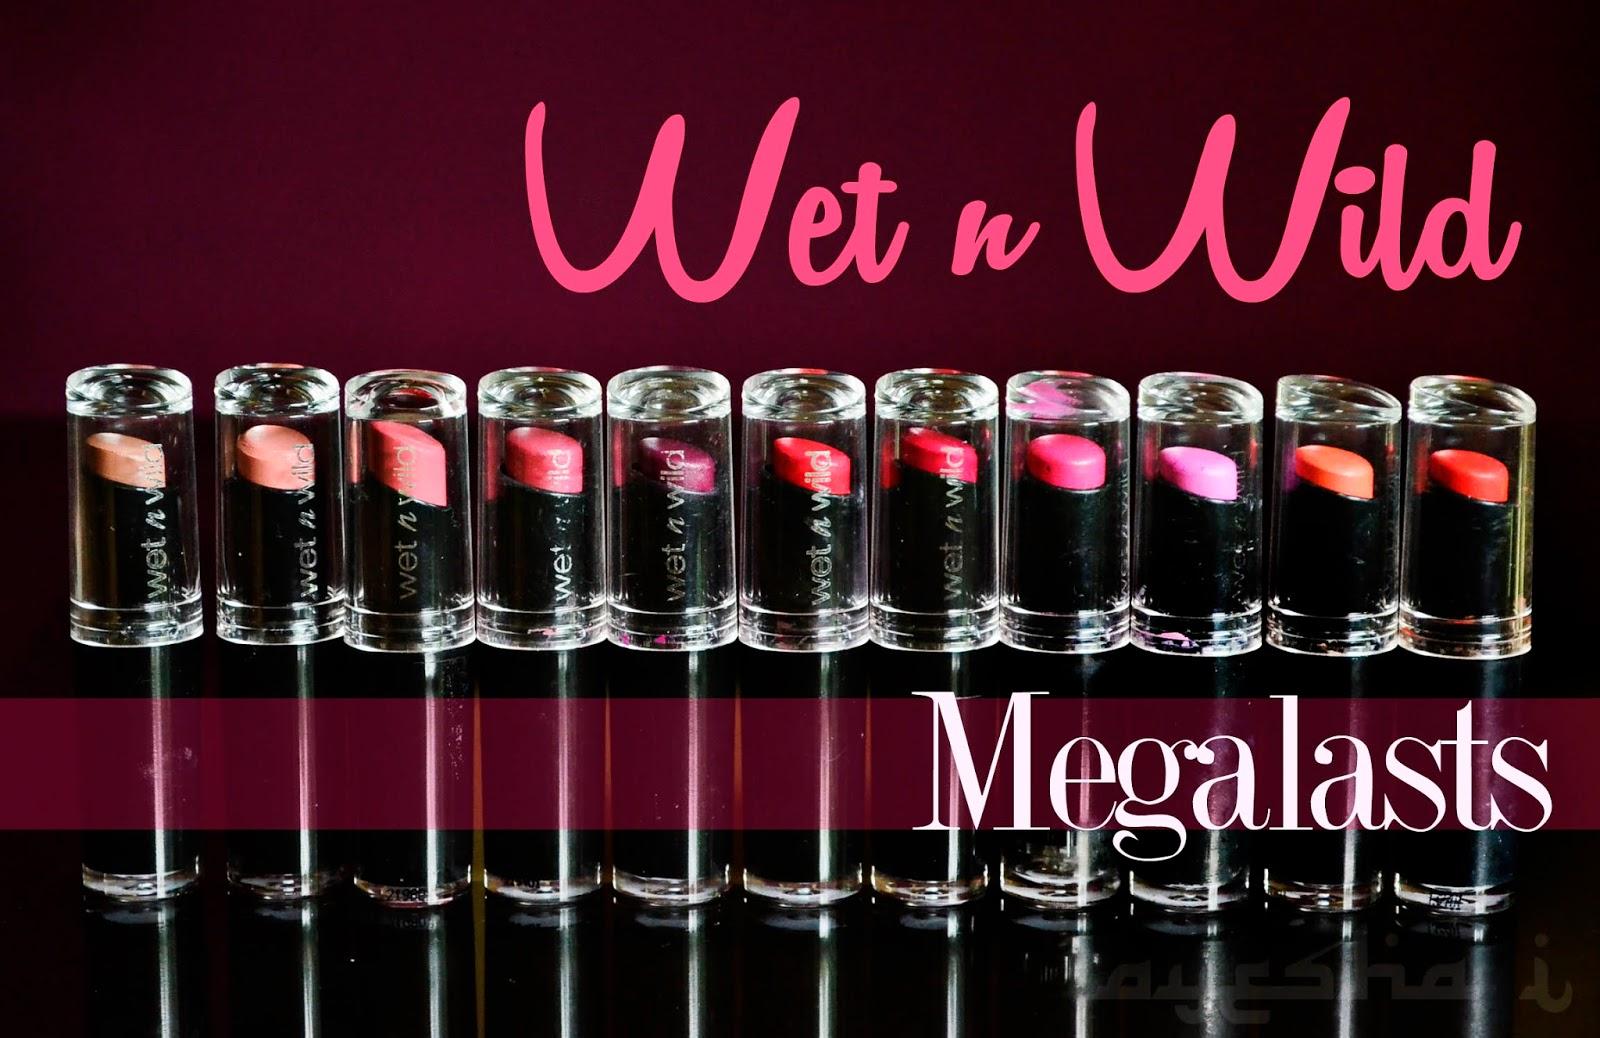 Wet n Wild Lipstick ลิปสติกติดทน เนื้อดี สีสวย